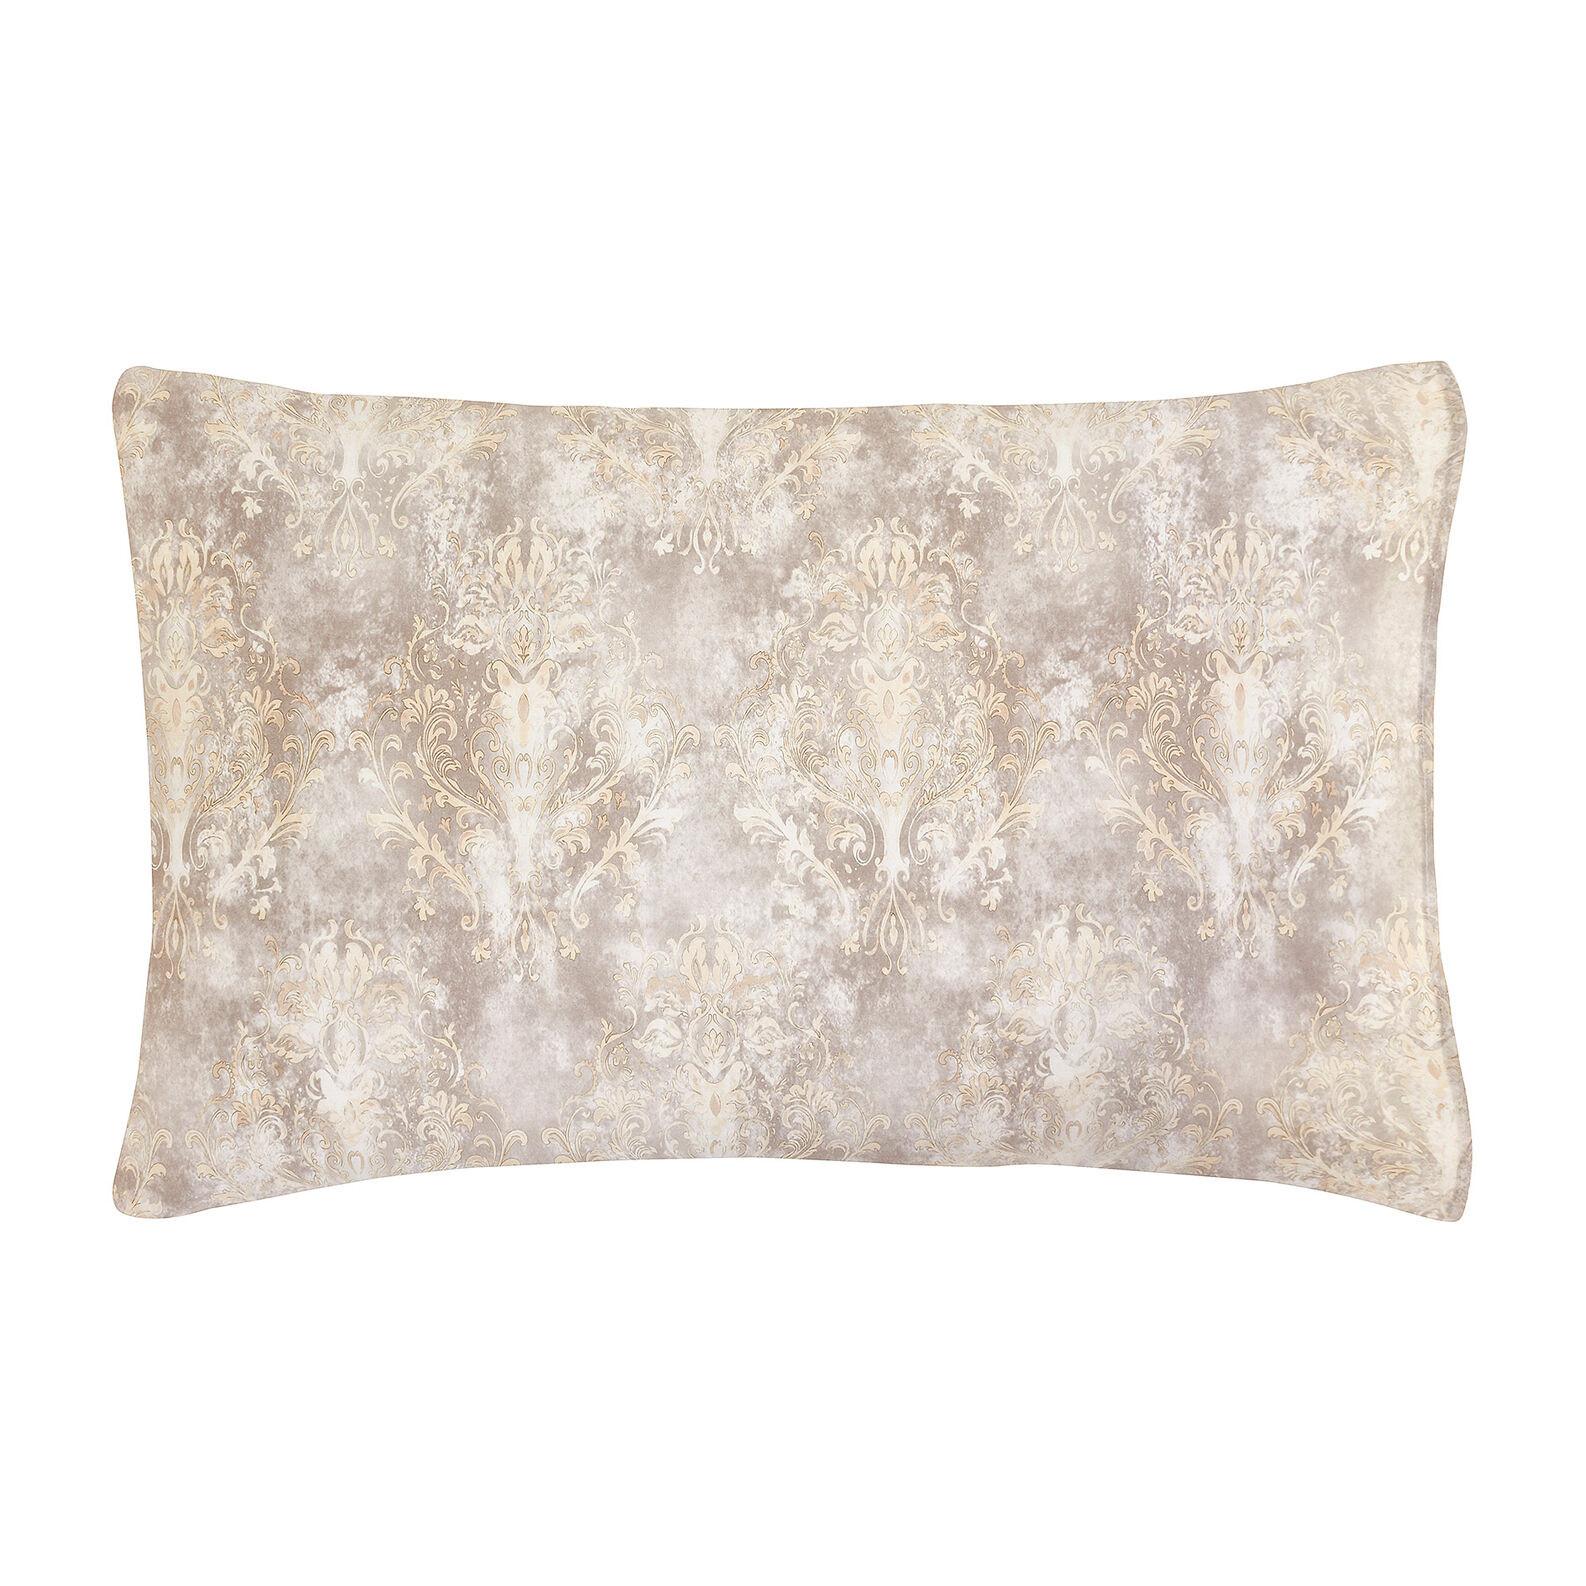 Federa raso di cotone fantasia cachemire, Beige, large image number 0